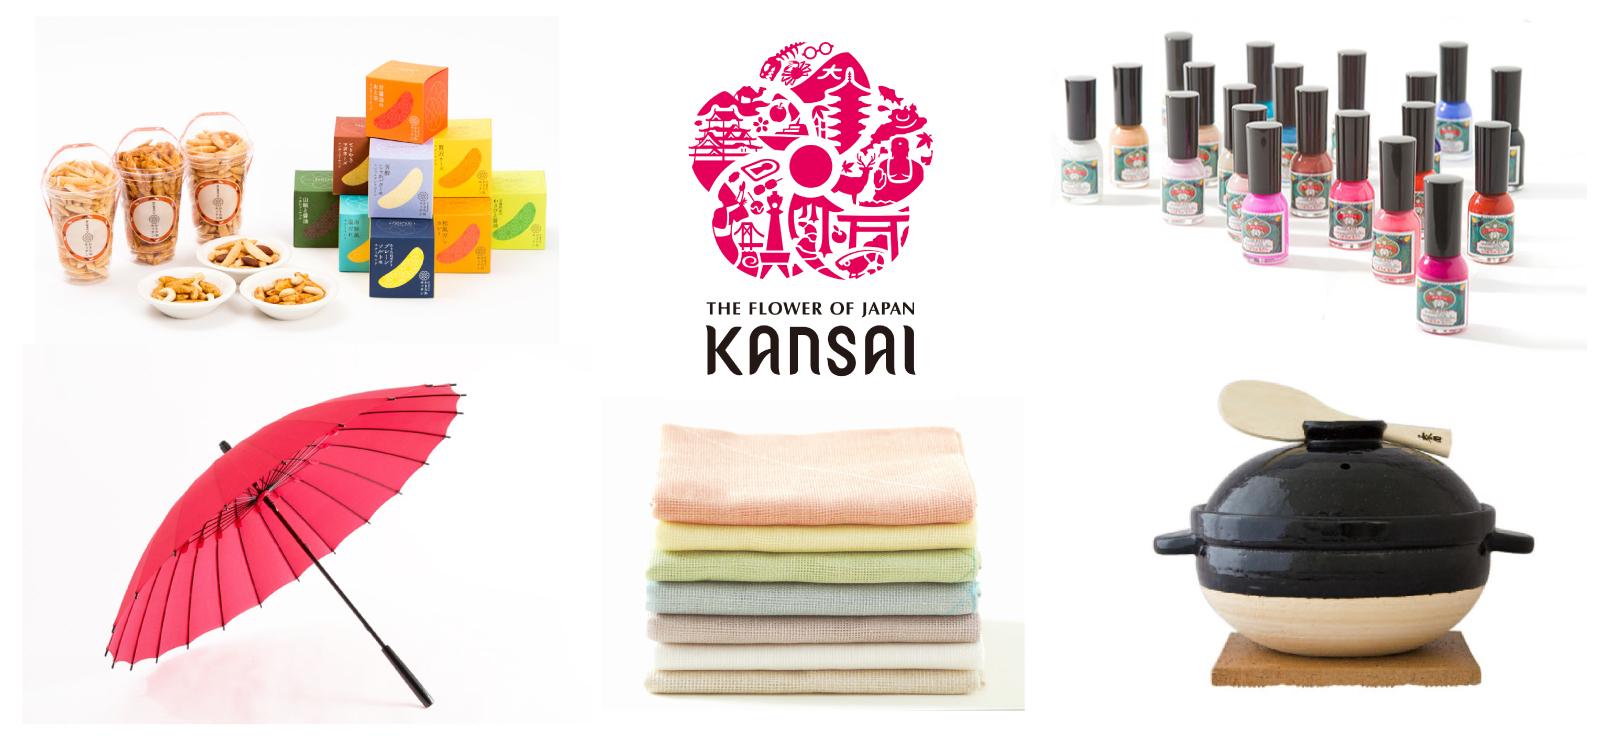 Sharing Kansai Brands with the World: Hanayaka Kansai Selection 2016